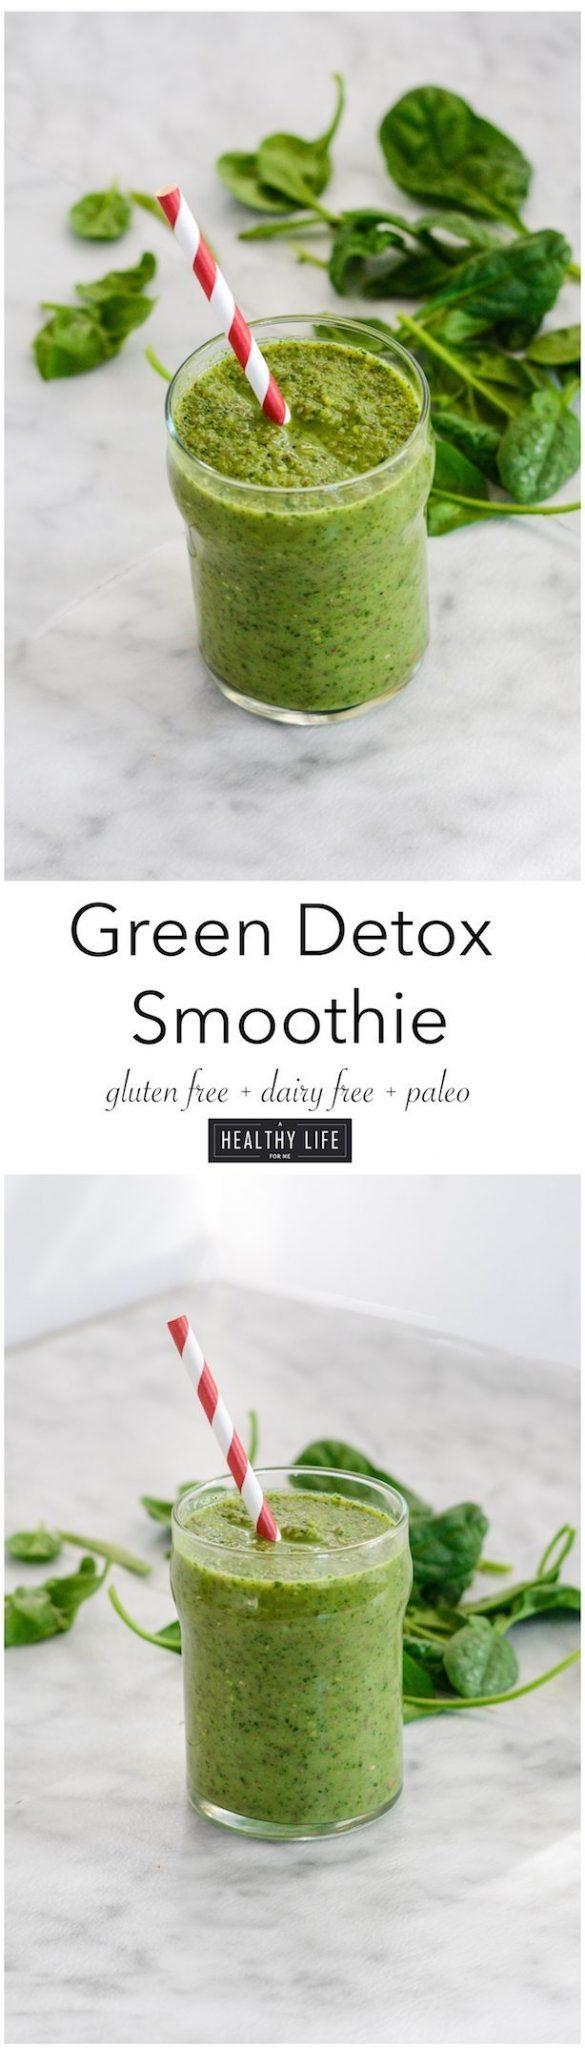 Green Detox Smoothie Recipe Gluten Free Dairy Free Paleo Friendly   ahealthylifeforme.com